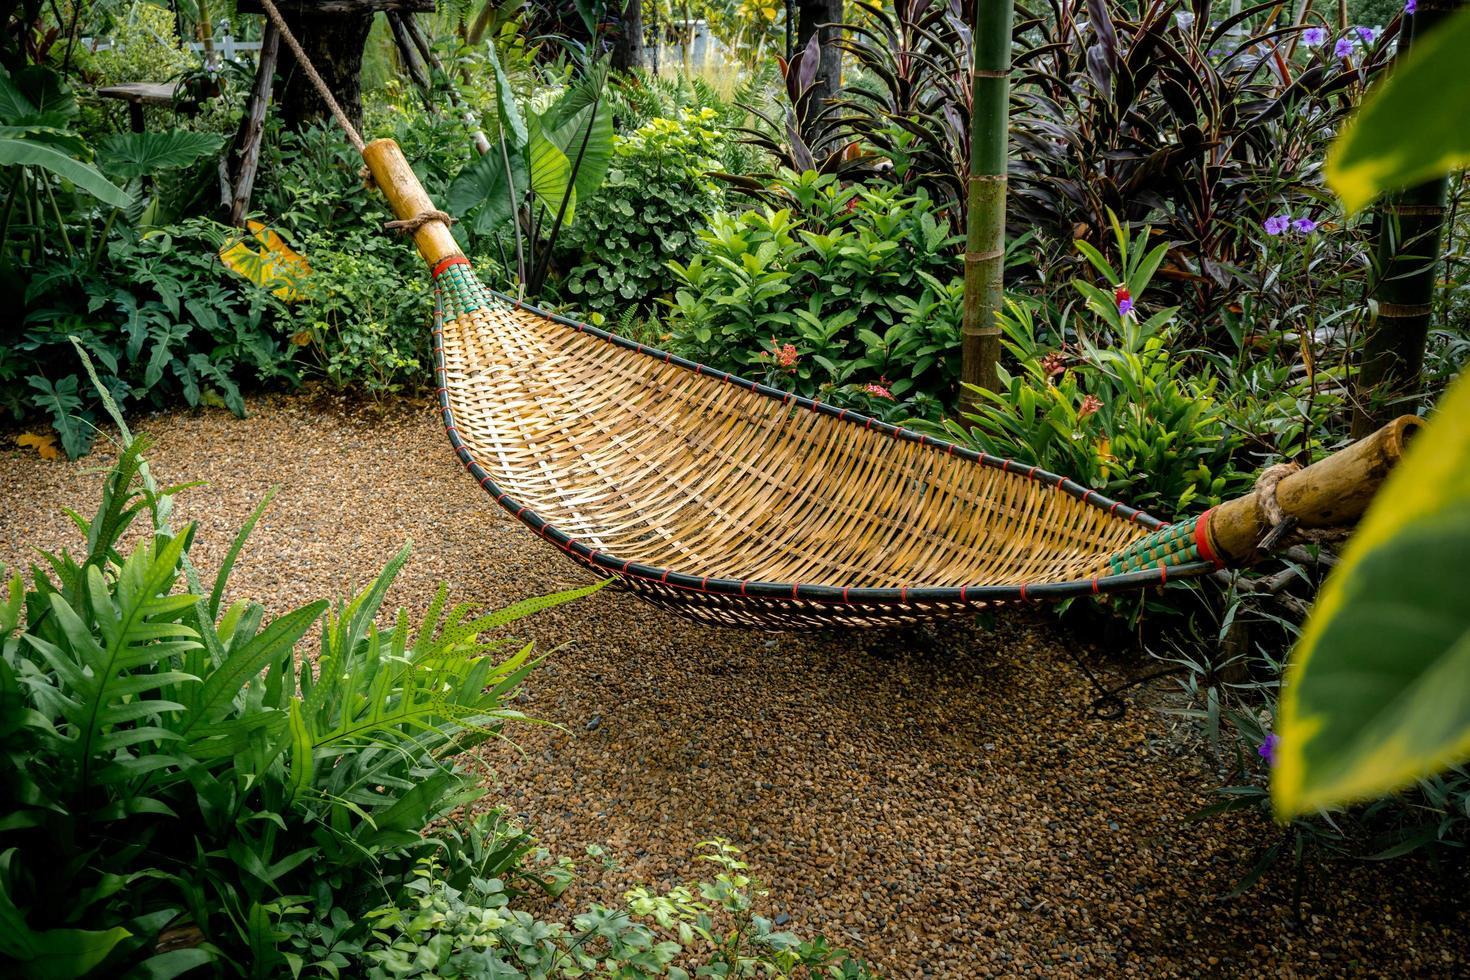 culla di bambù nel parco foto